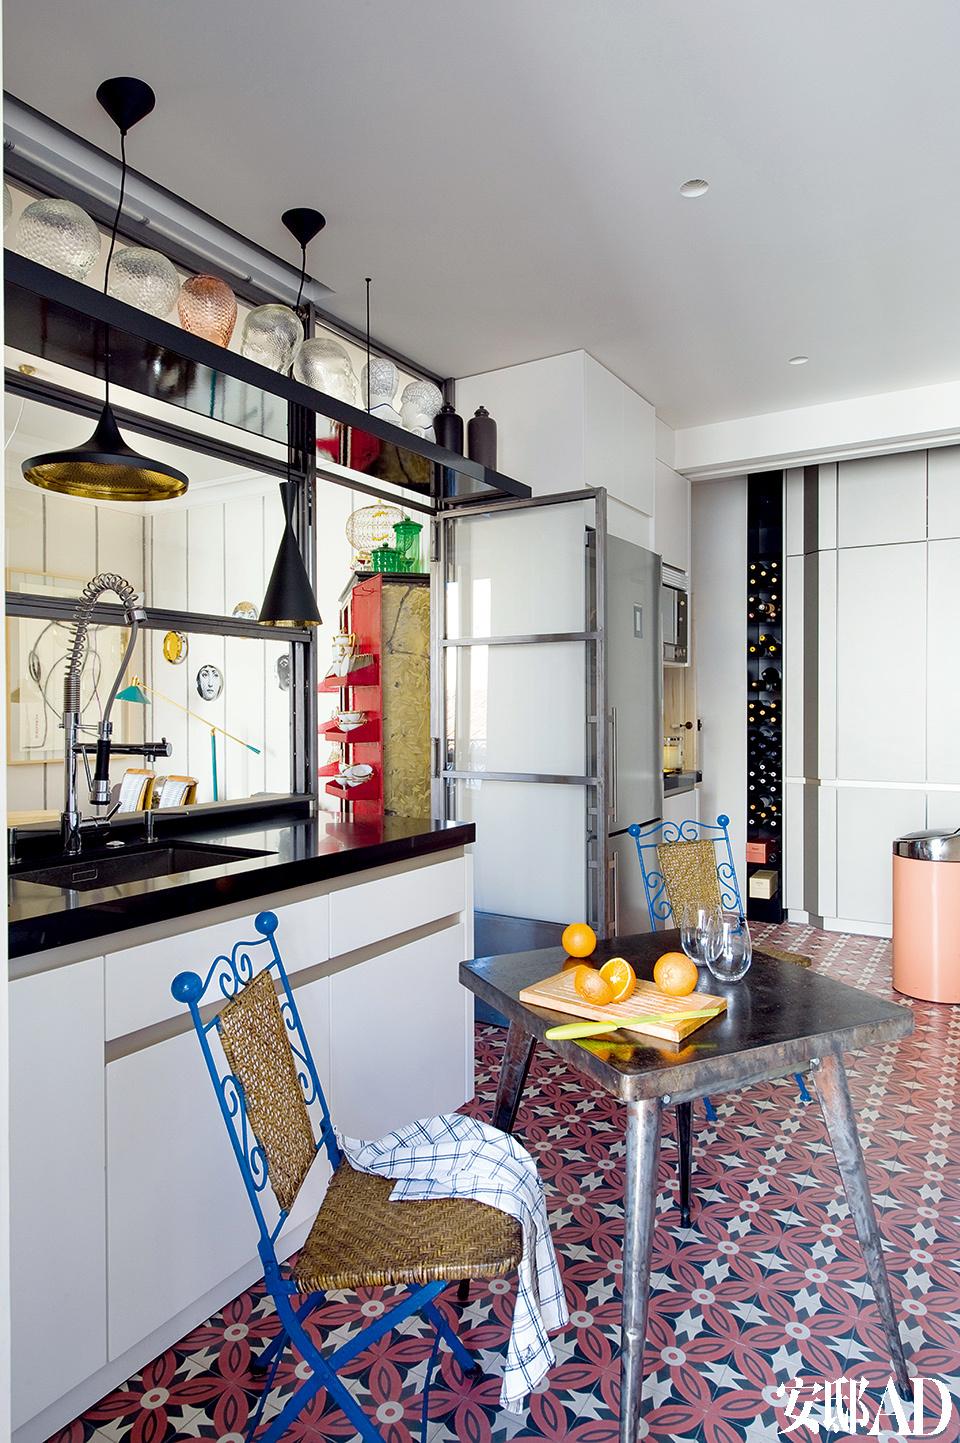 在厨房里,Tolix的桌子购自El Teatro De Los Sue?os,折叠椅购自比亚里茨。液压地板是Mosaic Del Sur的。